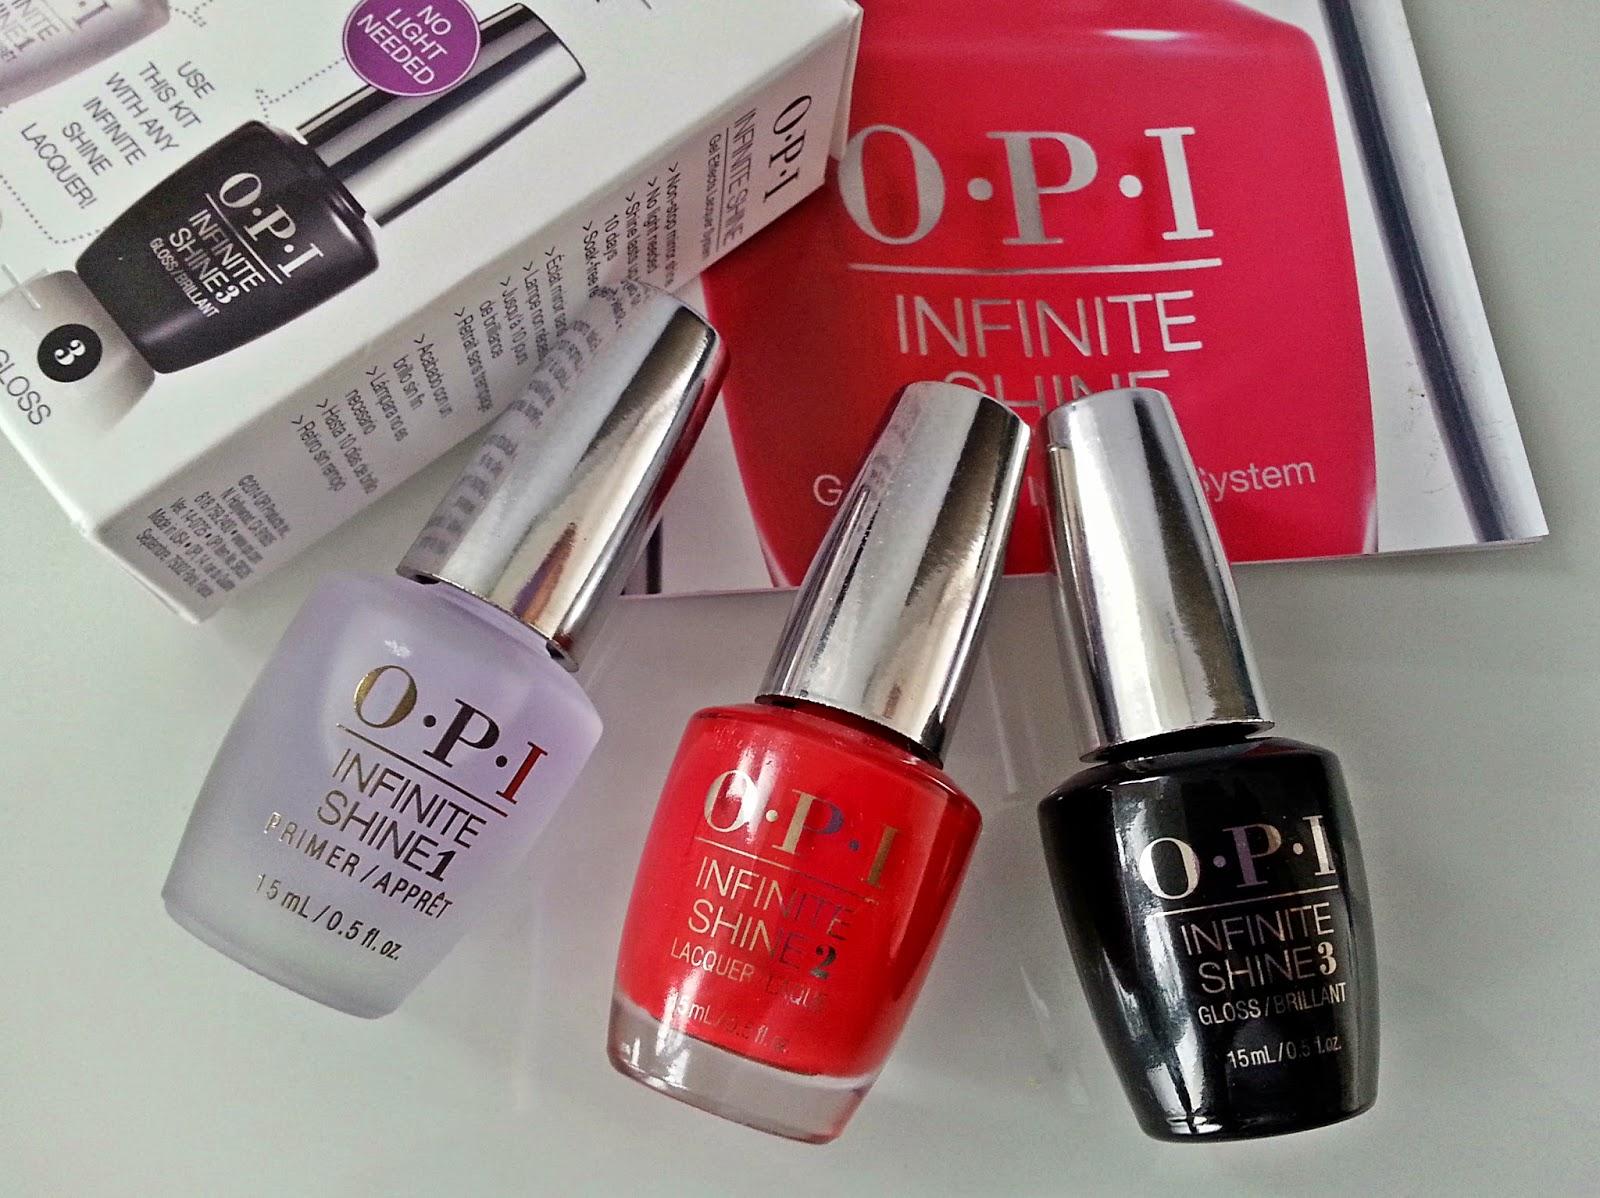 Lakierowa Mania Mani Beauty Blog Opi Infinite Shine Opis Systemu I Moja Opinia